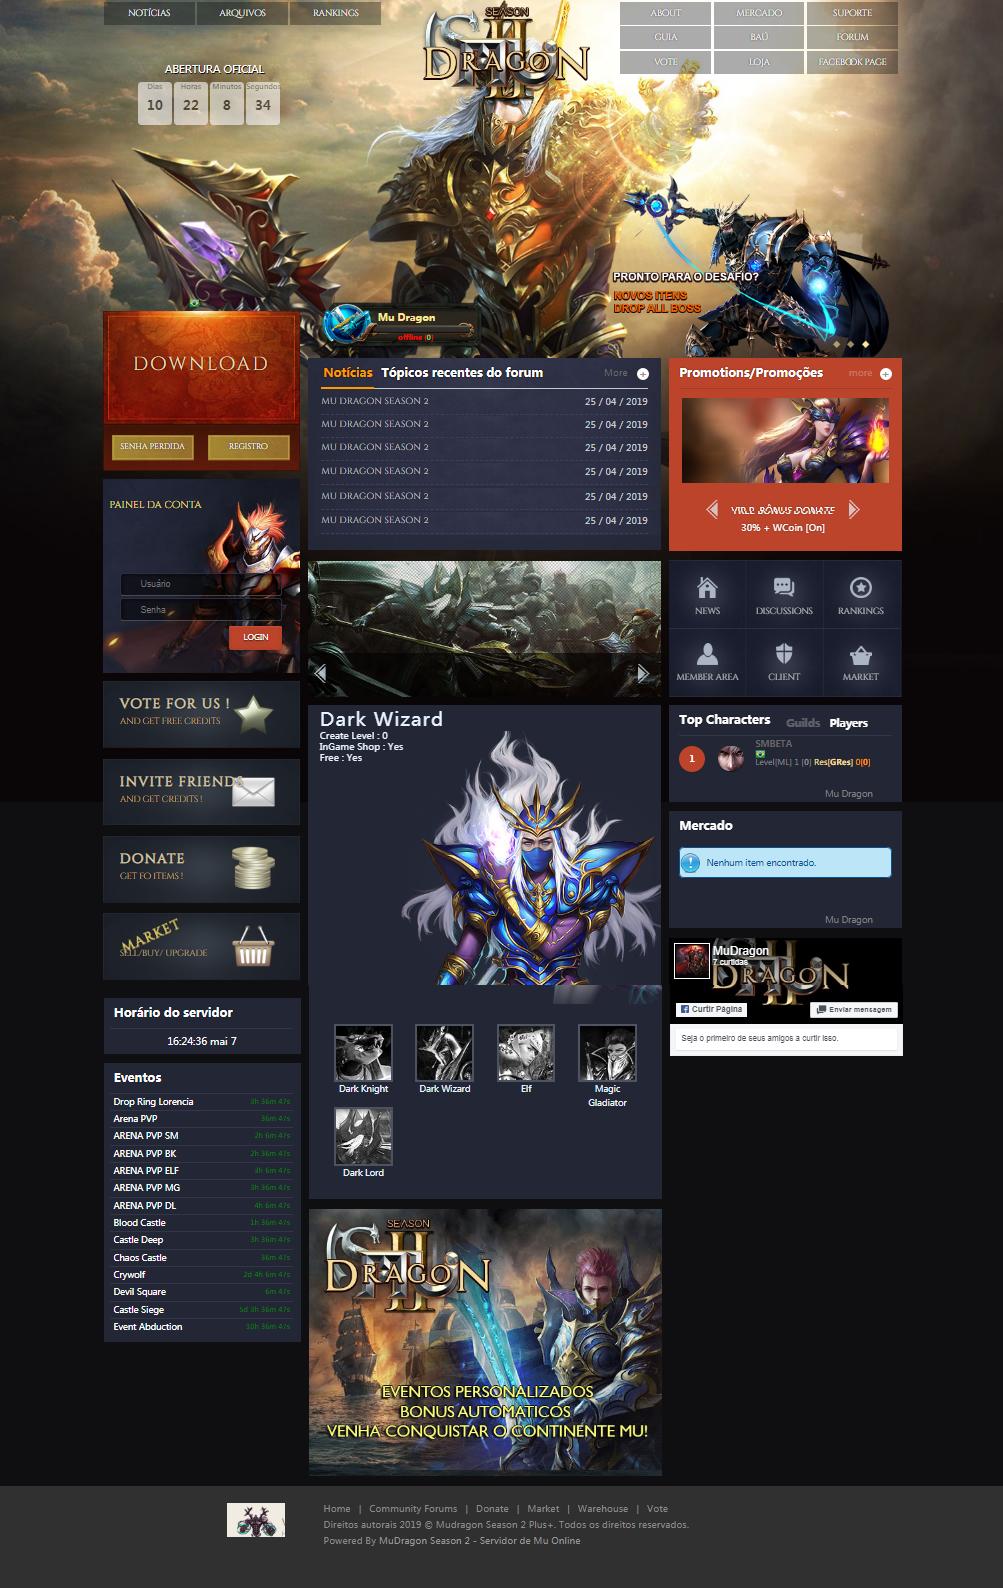 Web Mu Online DMN Mu Dragon atualizada 2019 - Modulos DMN - ModernDiv HttRequest - Como criar servidor de mu online season 14 atualizado, participe do discord Galera MU